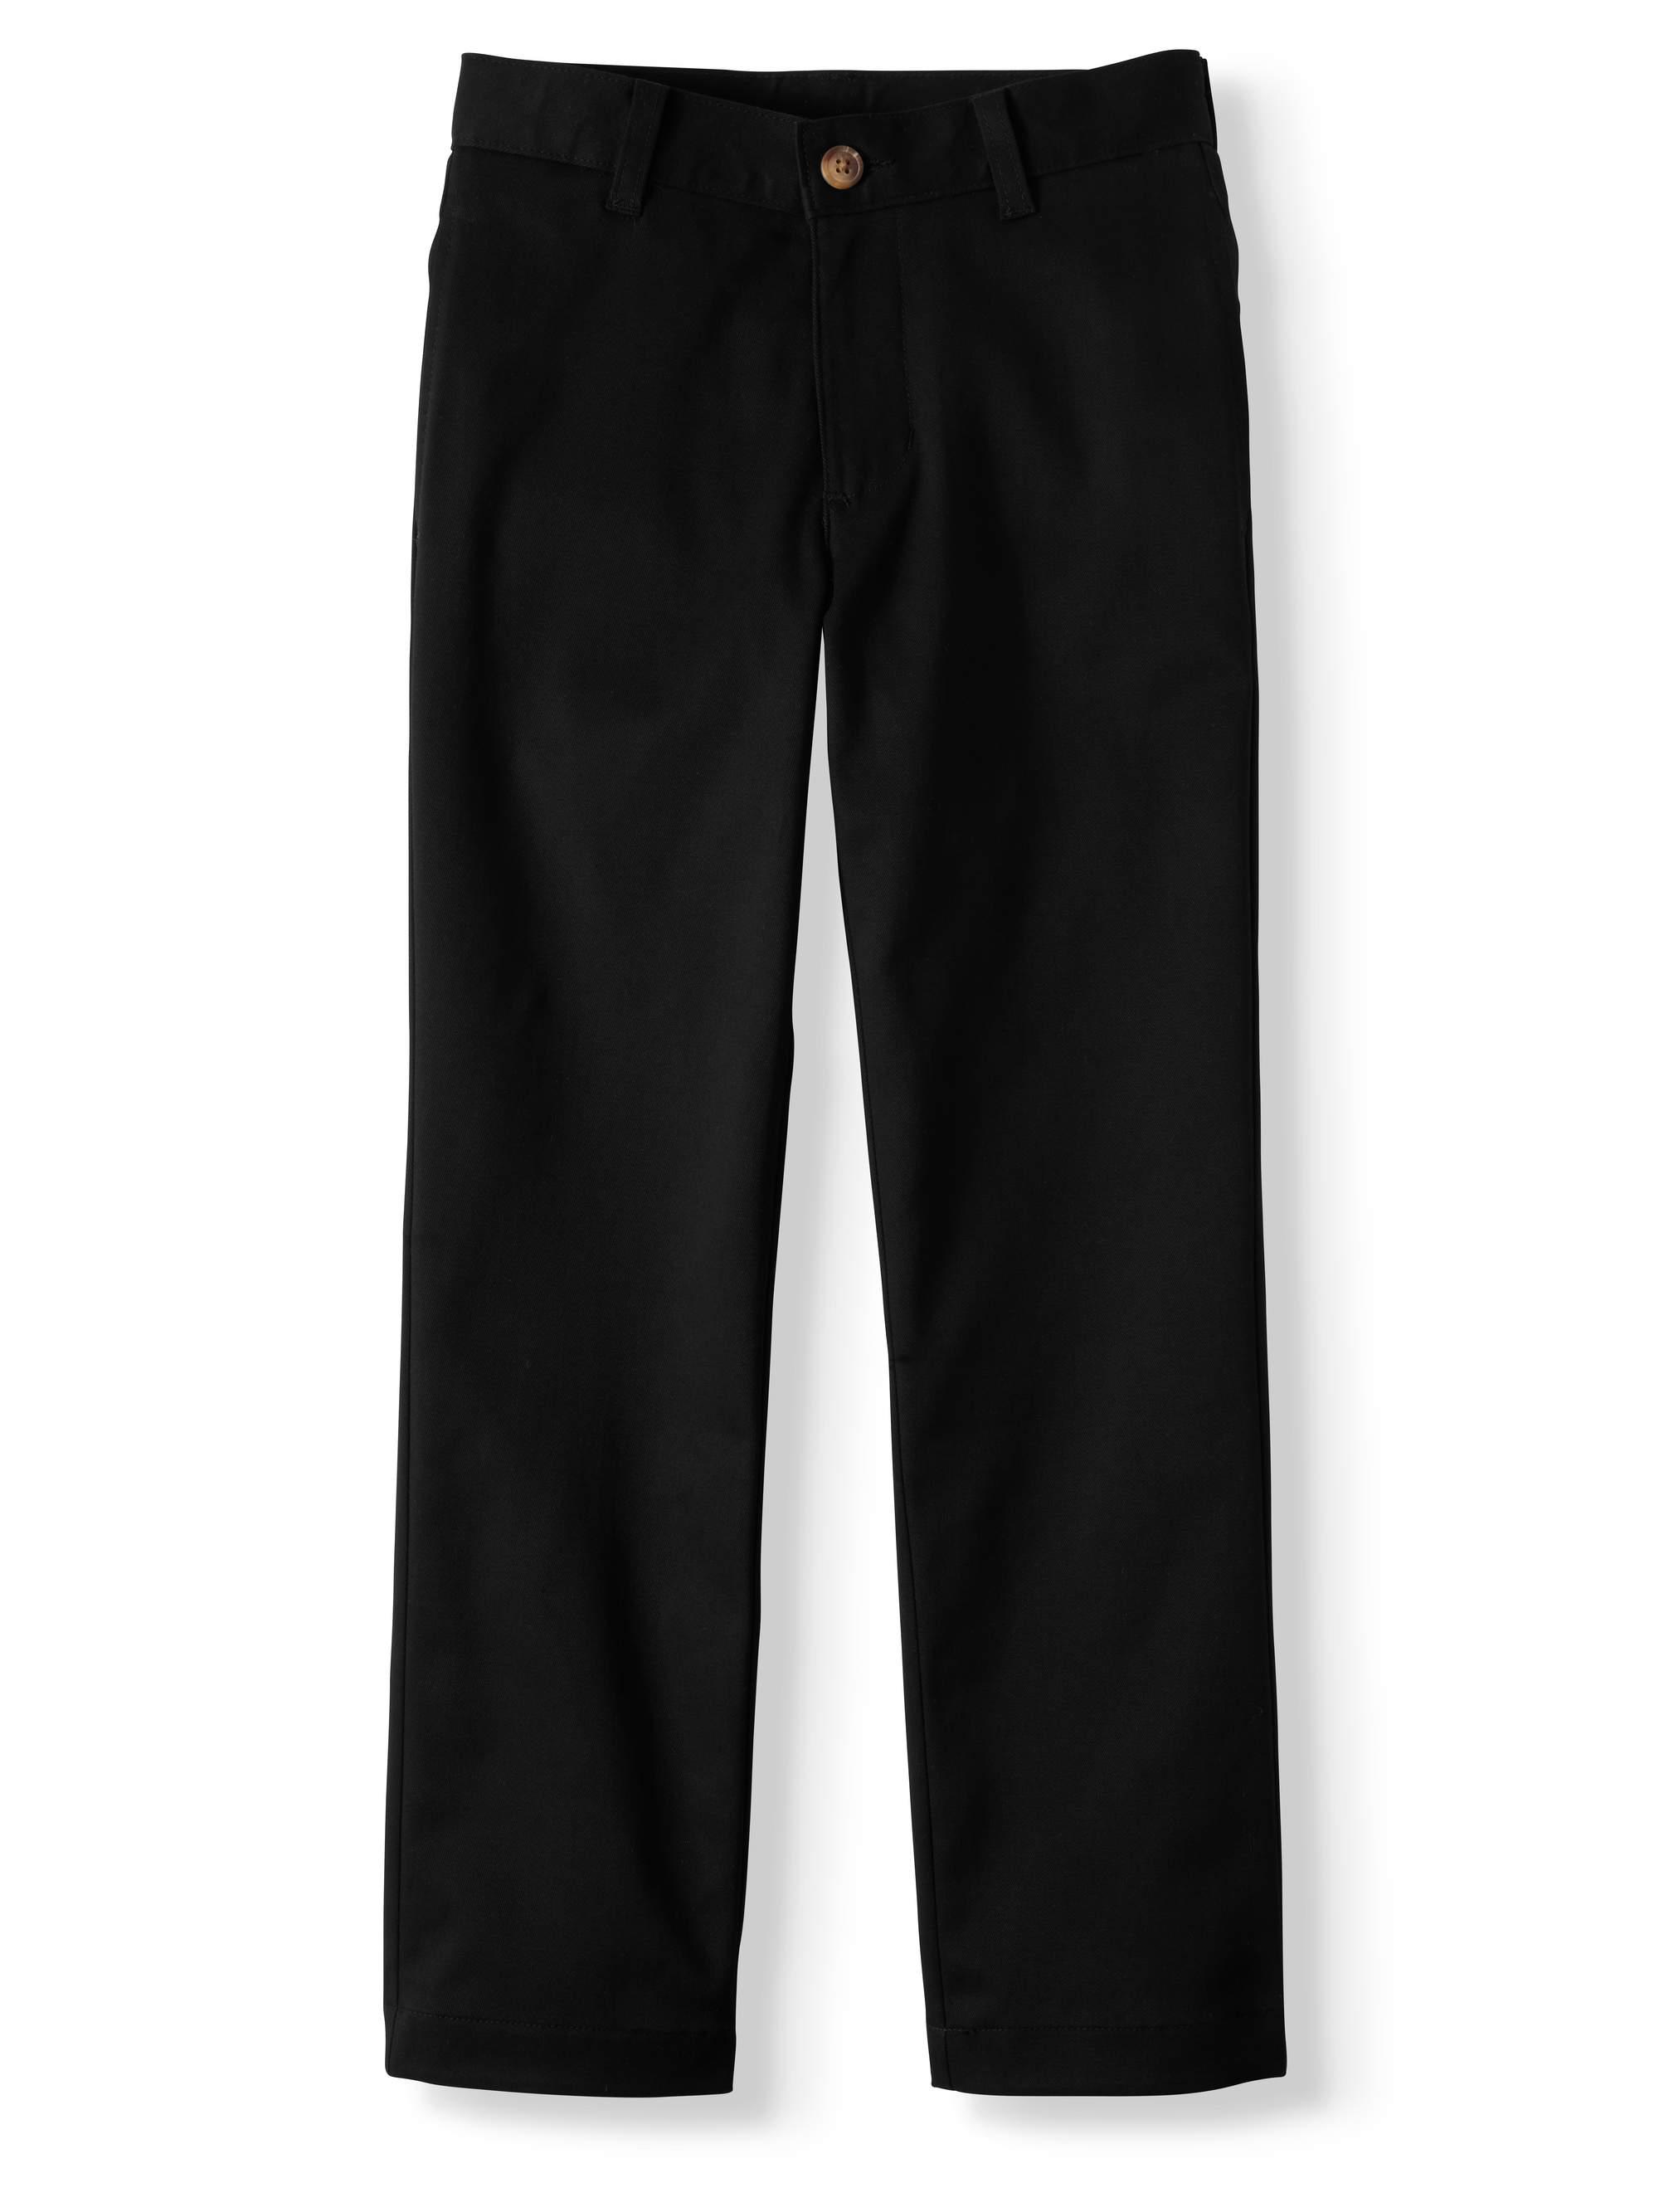 Boys Prep School Uniform Super Soft Flat Front Pants